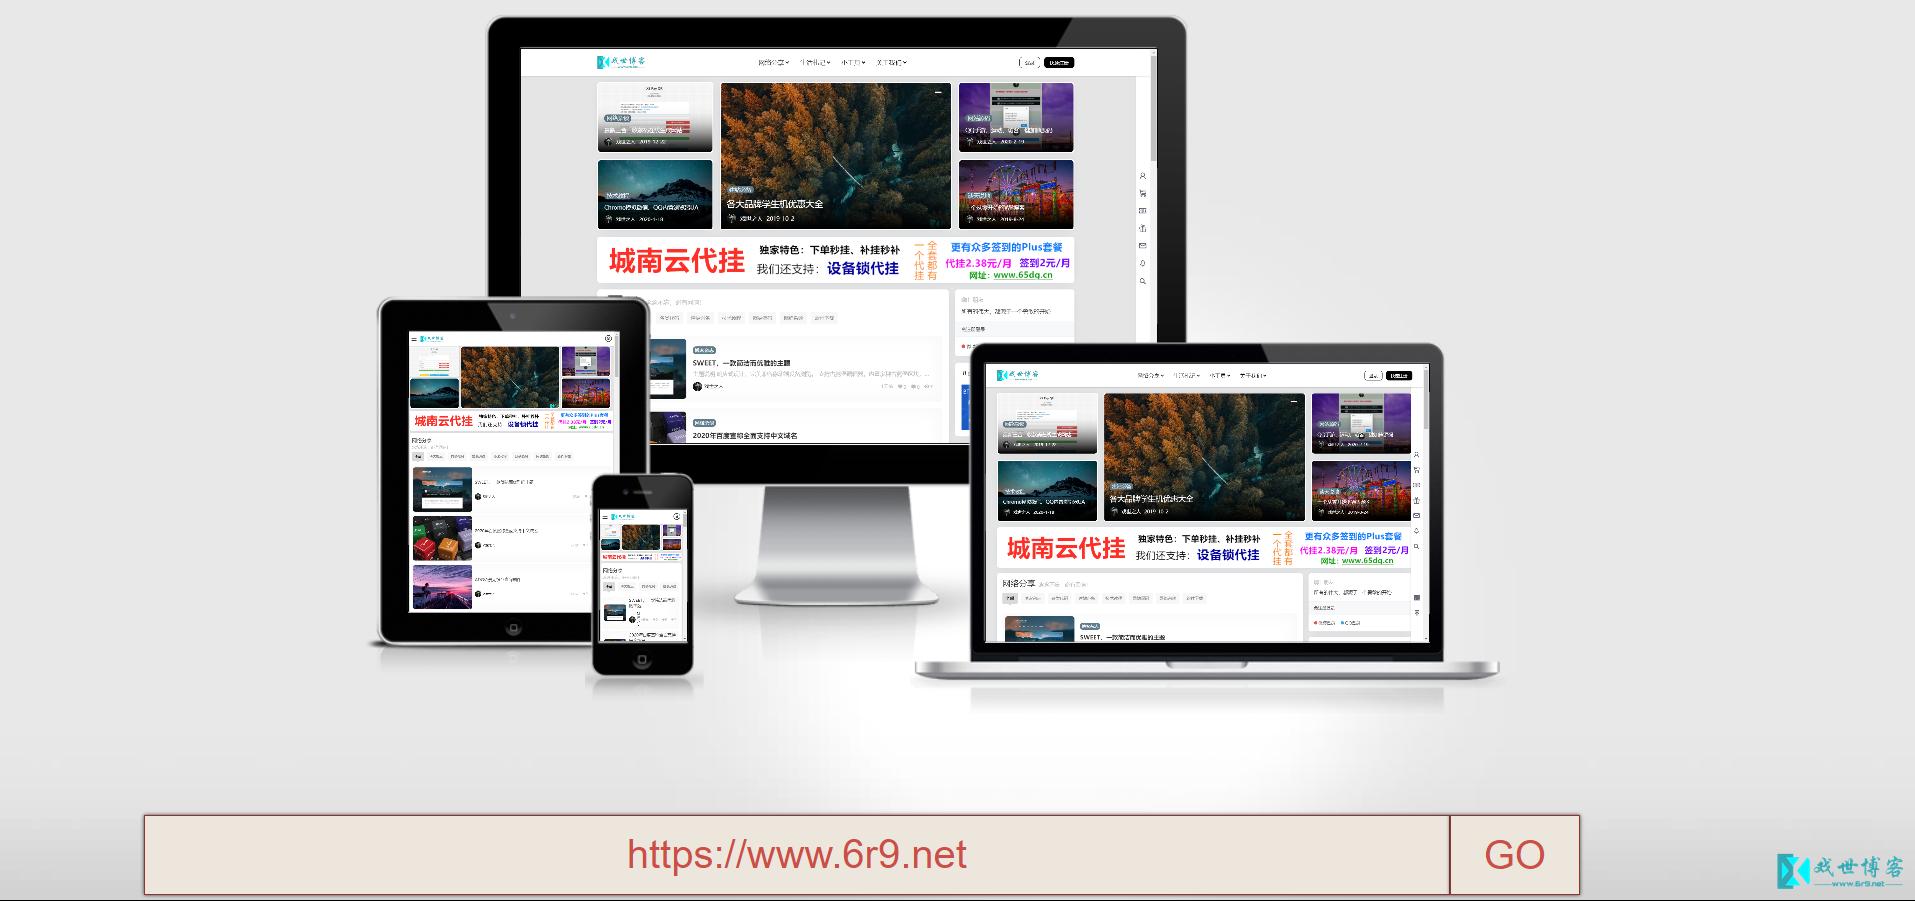 ShrinkTheWeb – 一个免费缩略图在线生成网站源码